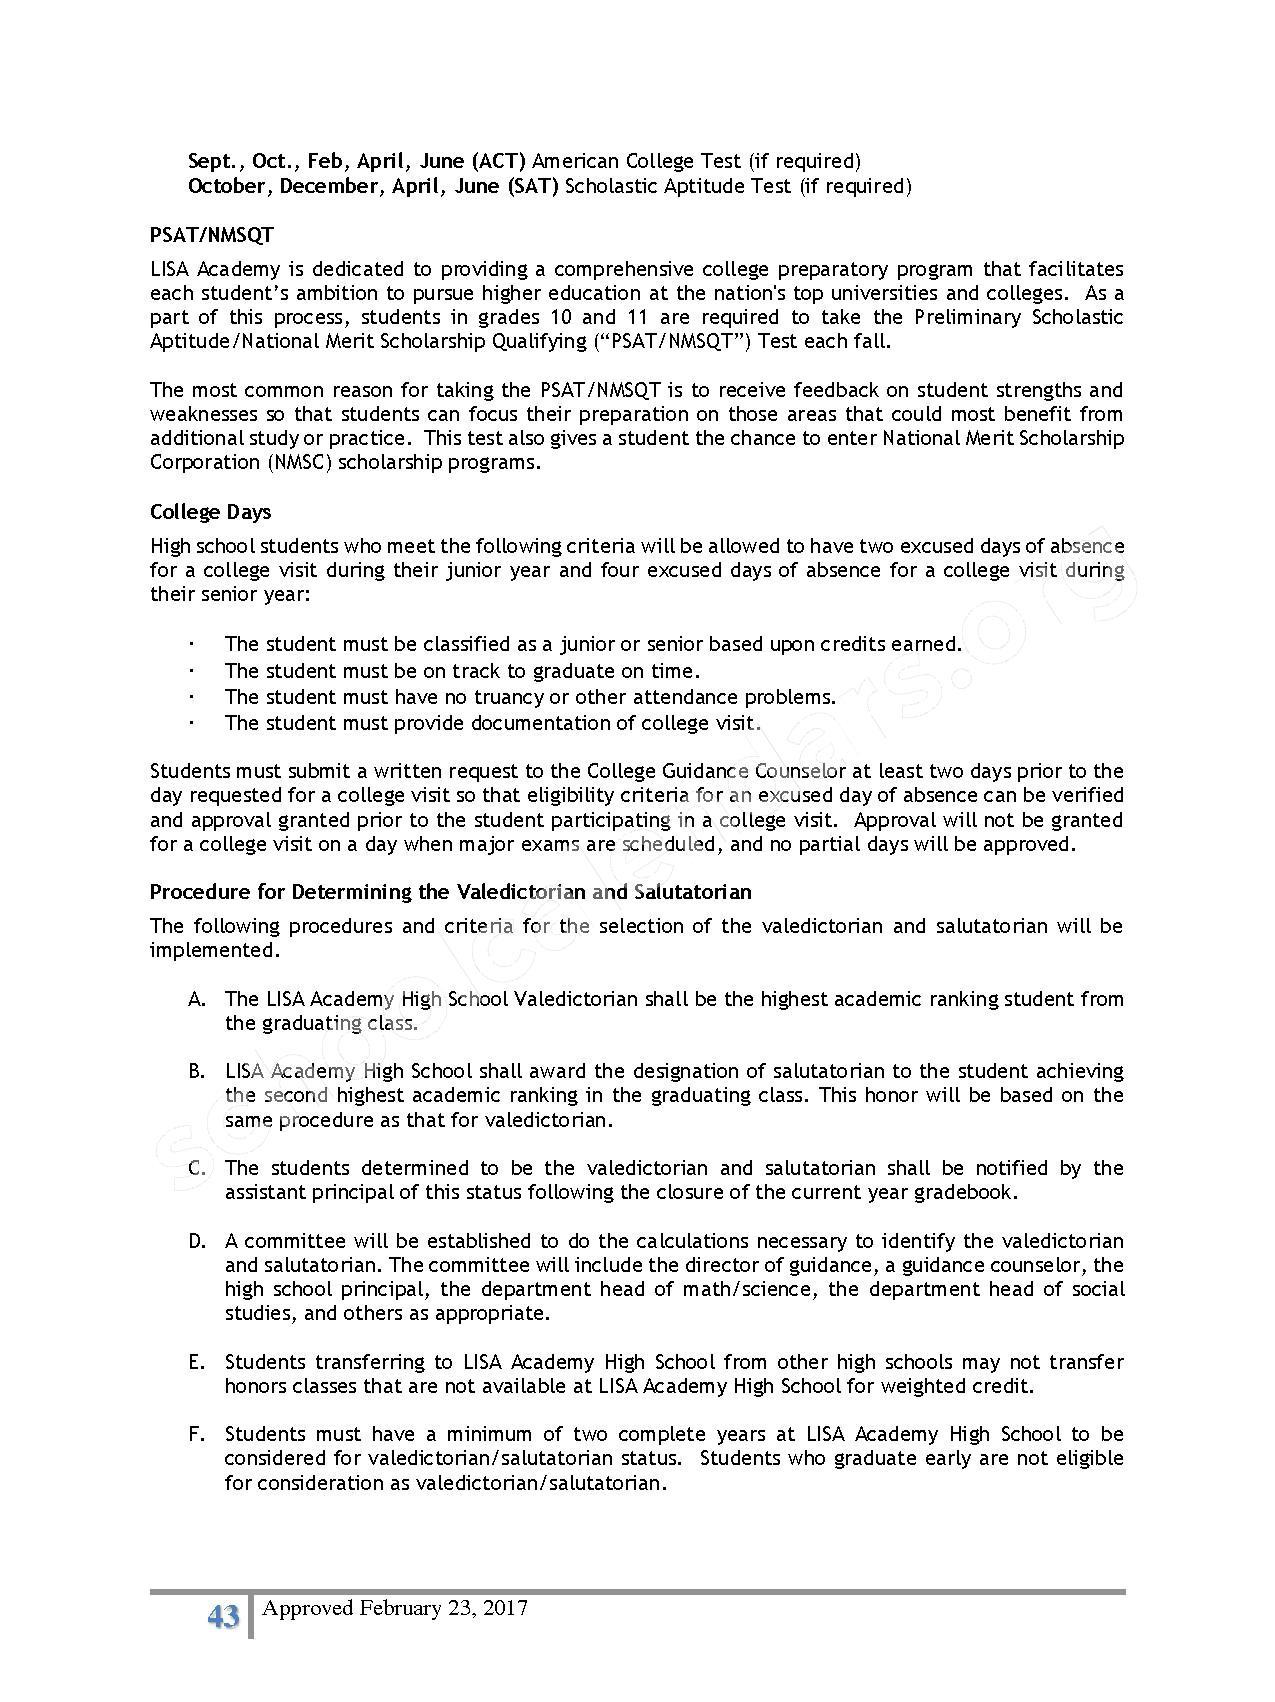 2016 - 2017 District Calendar – Lisa Academy Public Charter Schools – page 43